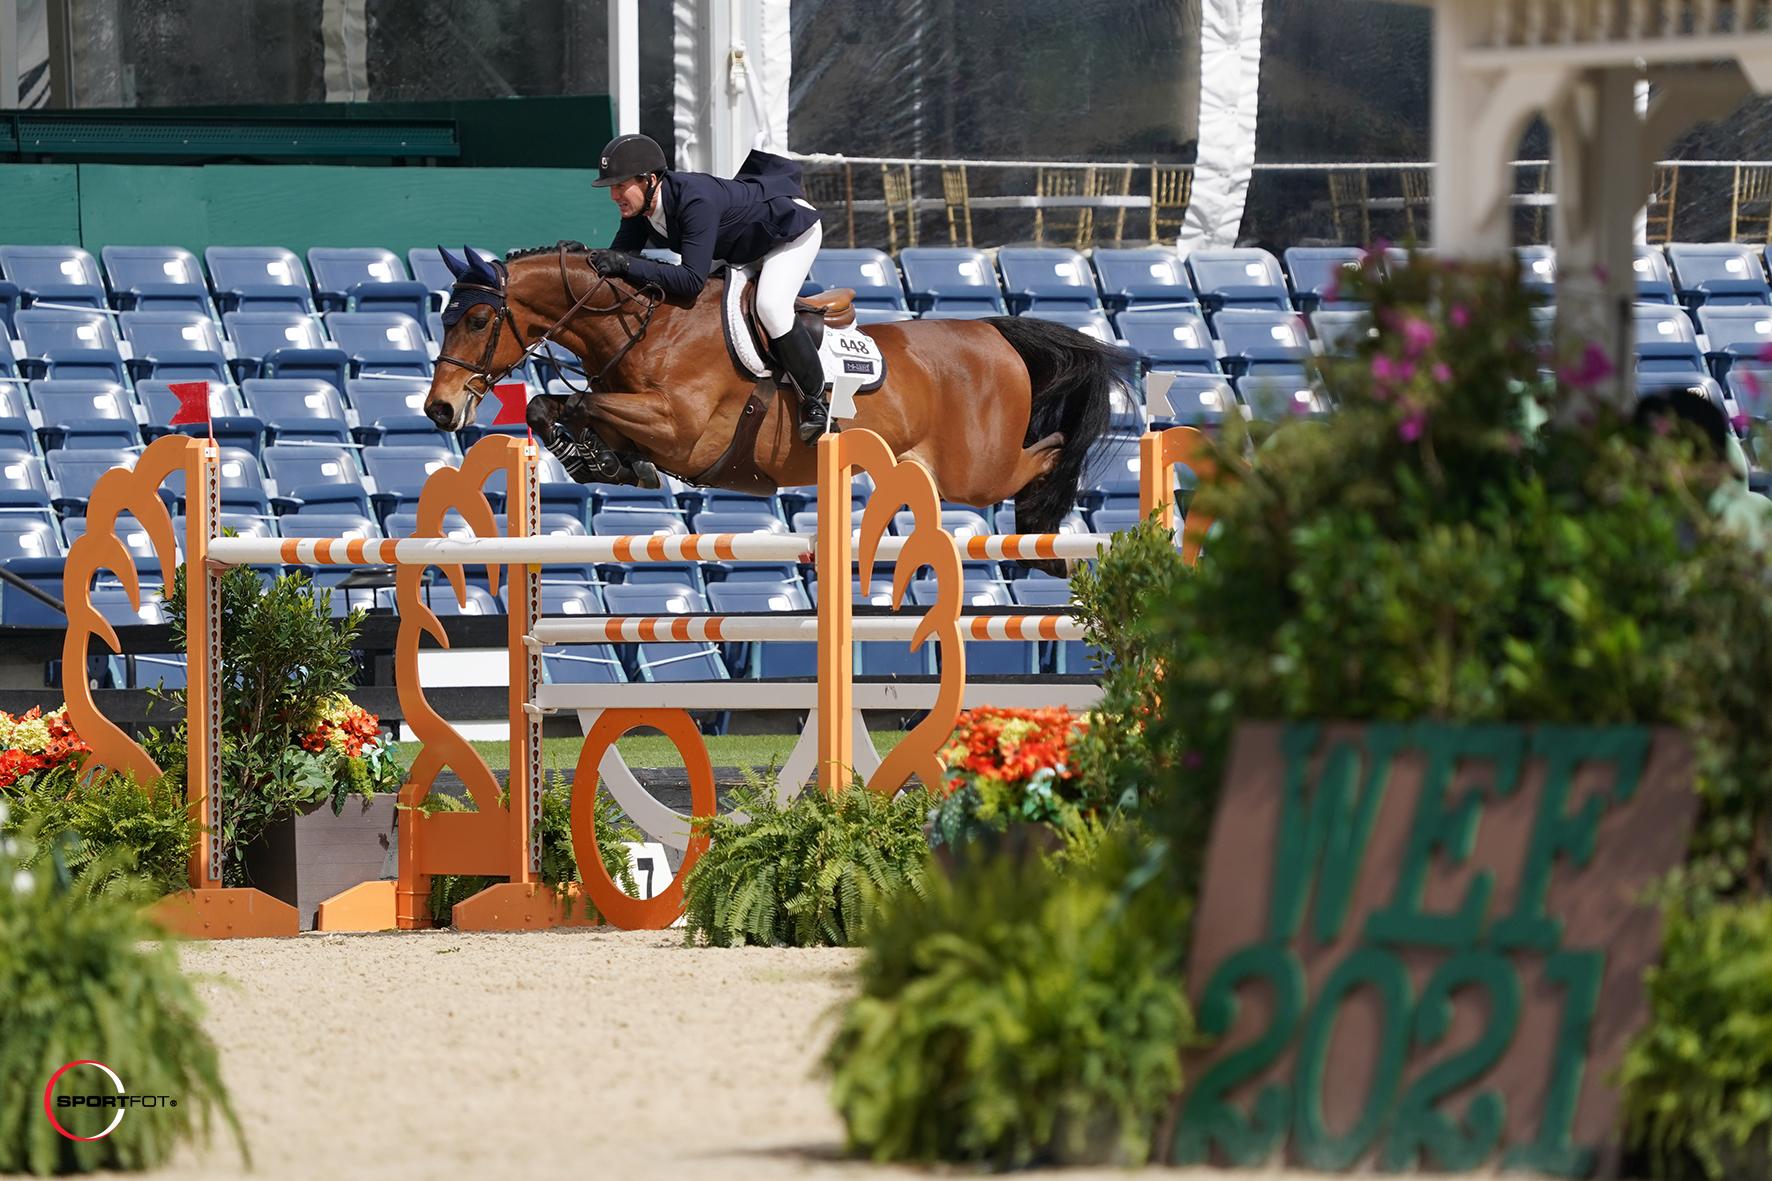 McLain Ward and Catoki start with a win in Wellington